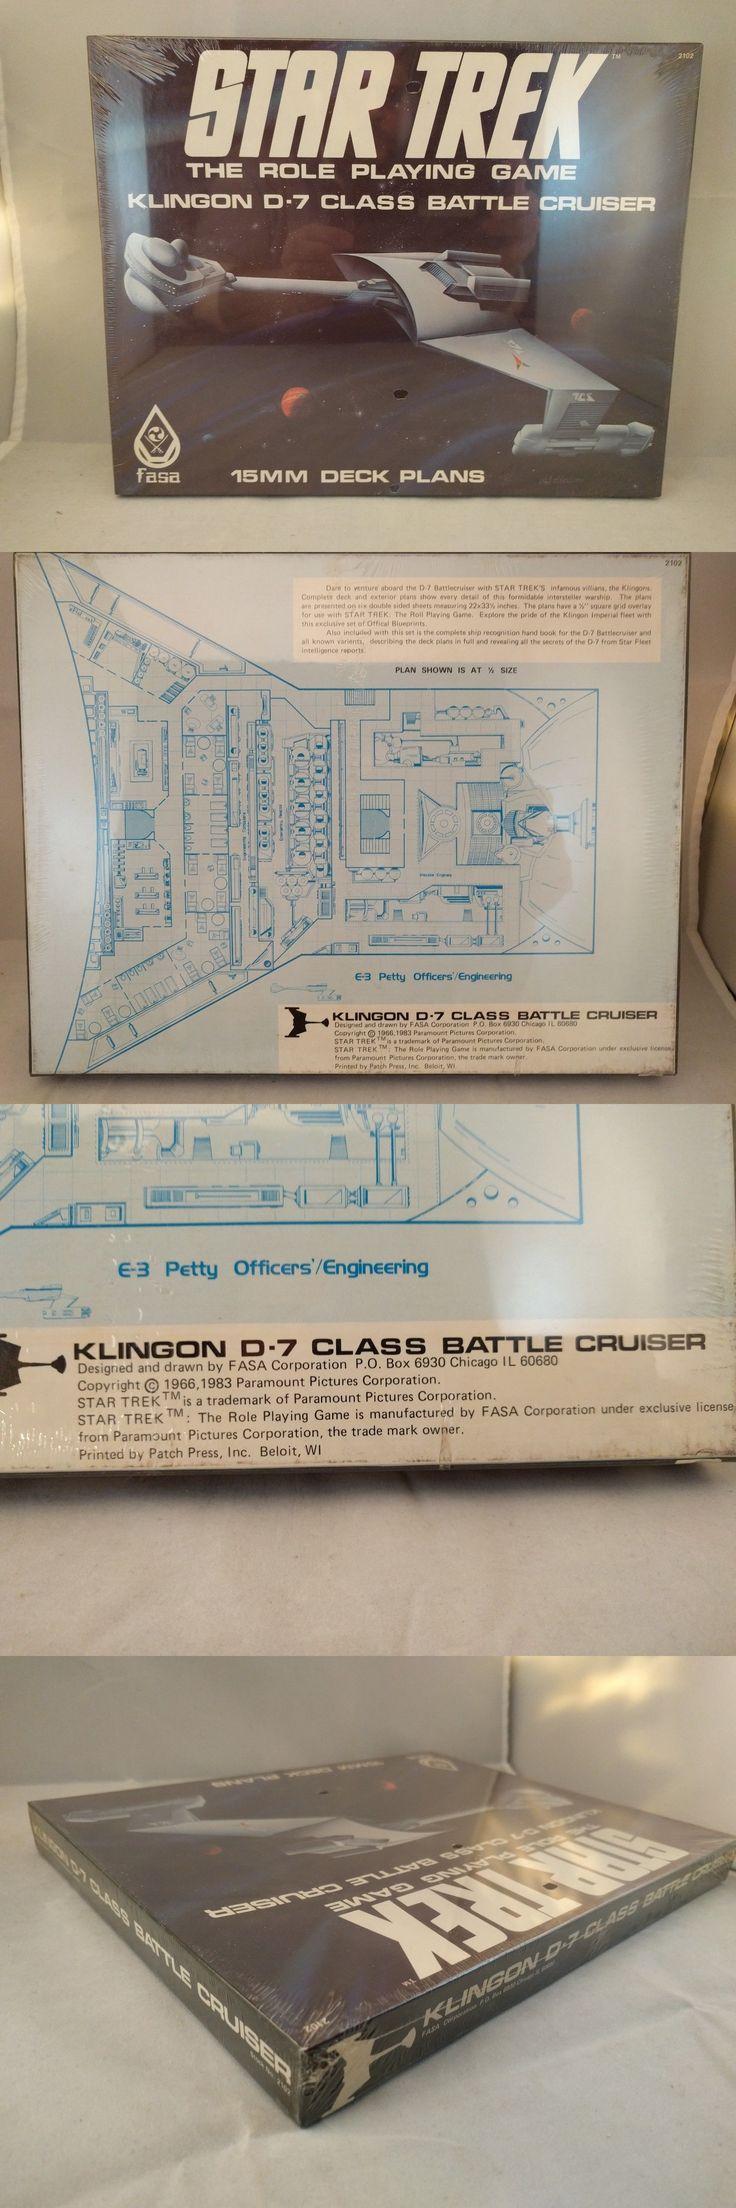 Science Fiction 2547: Star Trek Rpg Klingon D-7 Class Battle Cruiser 15Mm Deck Plans Fasa *In Shrink* -> BUY IT NOW ONLY: $79 on eBay!